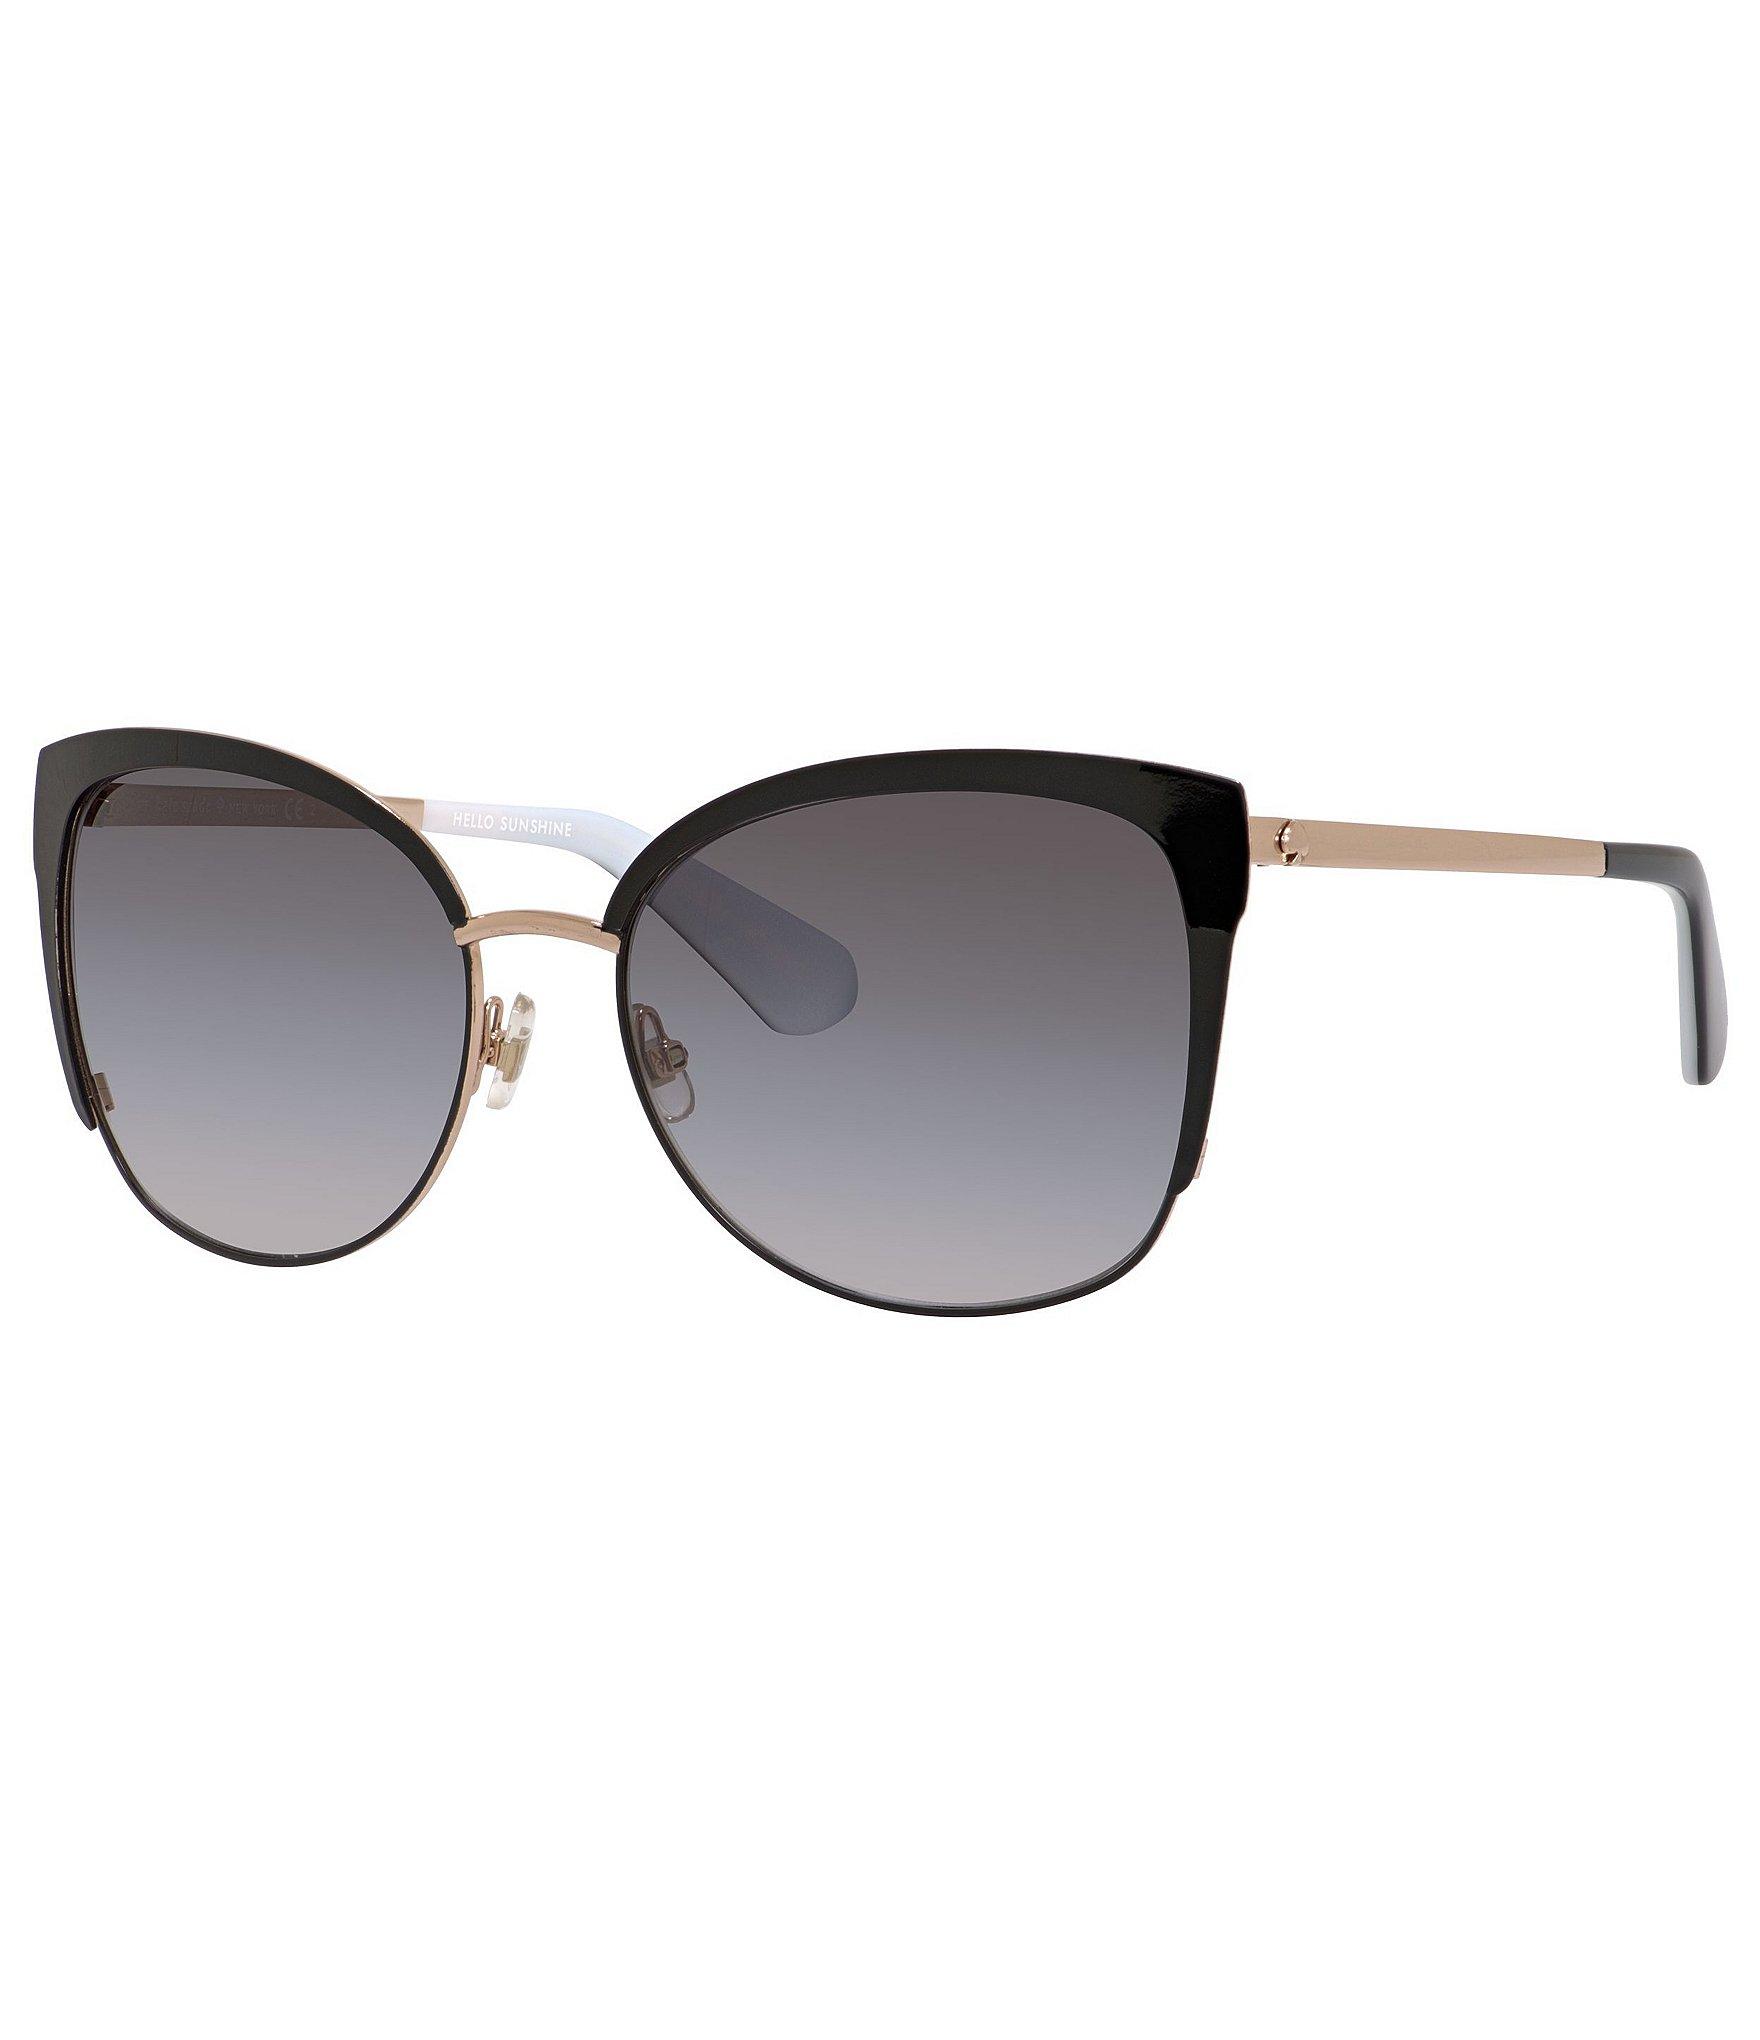 kate spade new york Genice Cat-Eye Sunglasses | Dillards